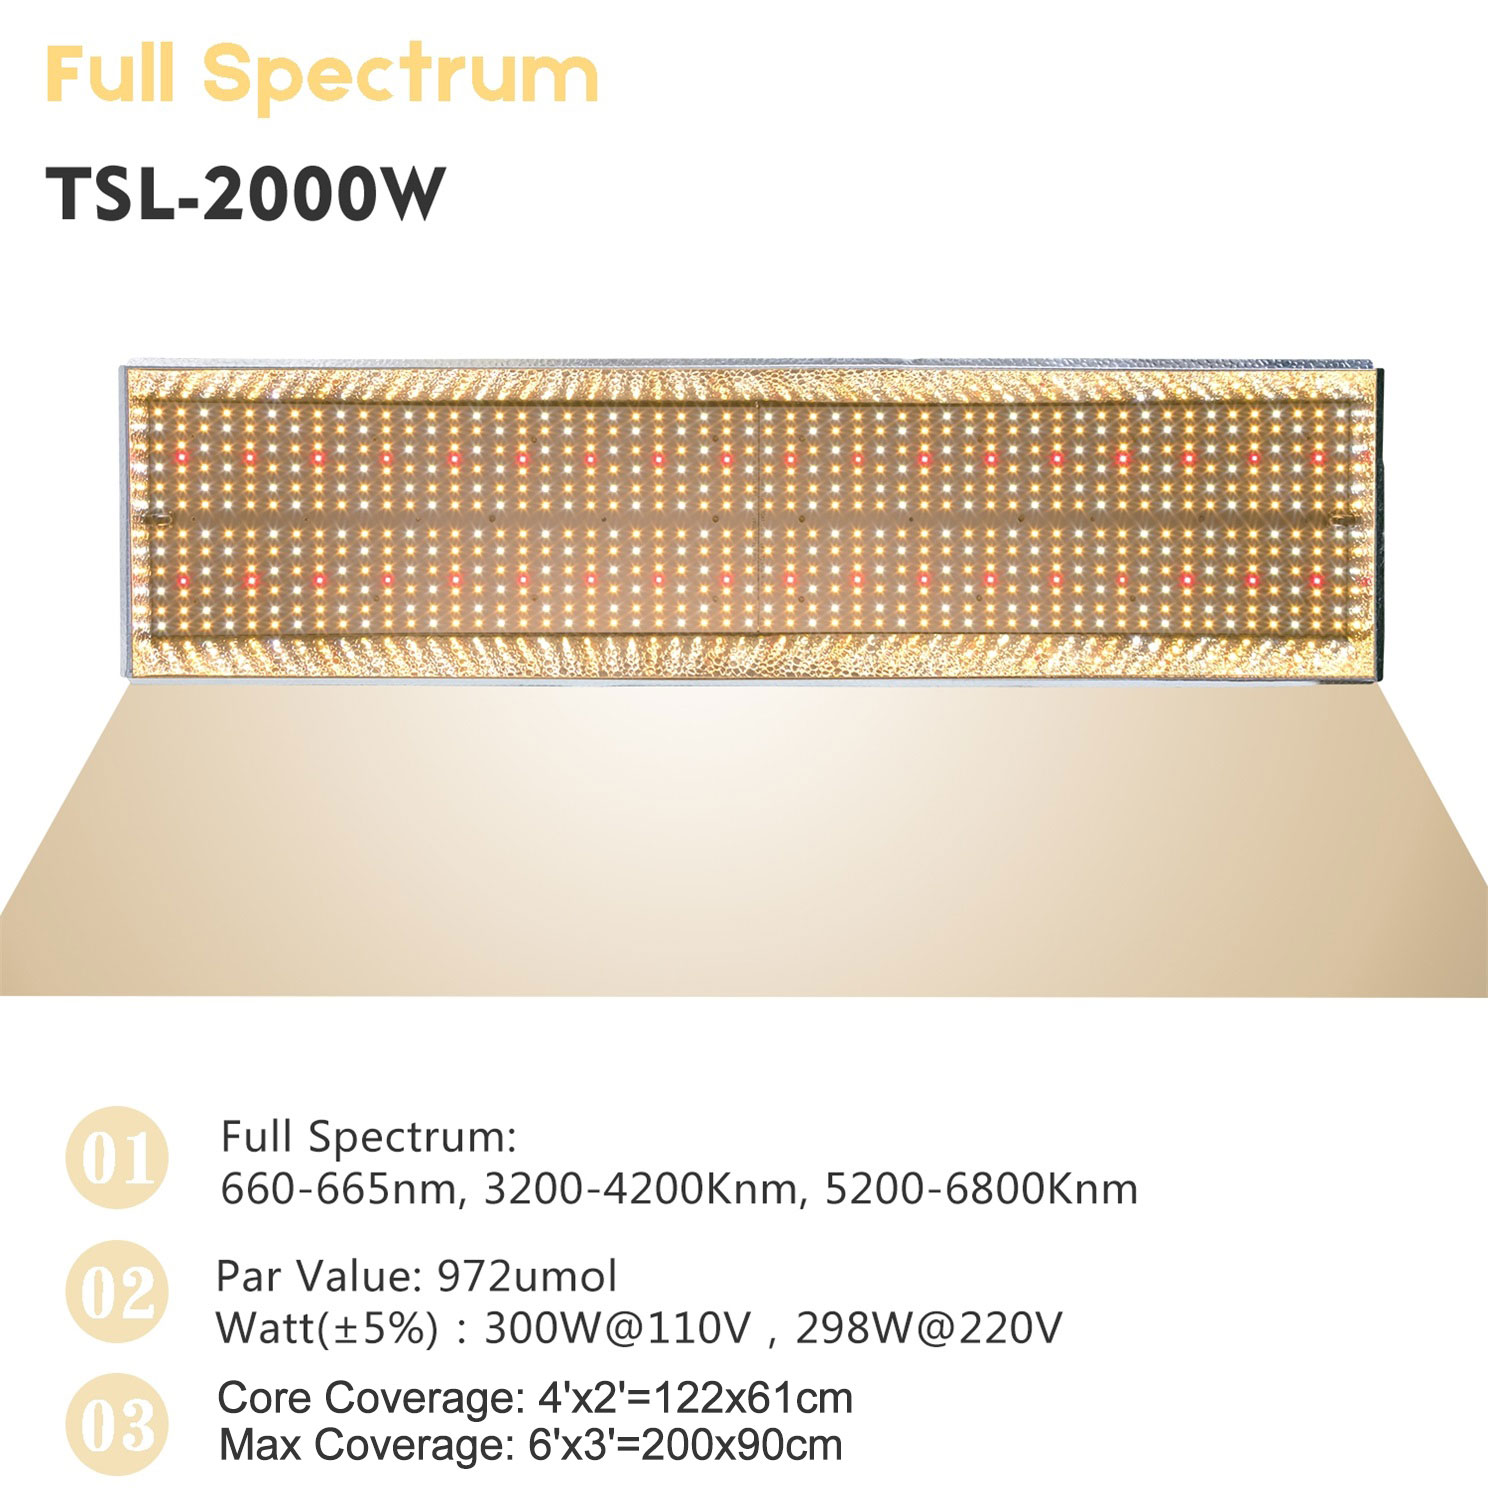 Mars Hydro Ts 600w 1000w 2000w 3000w Led Grow Light Full